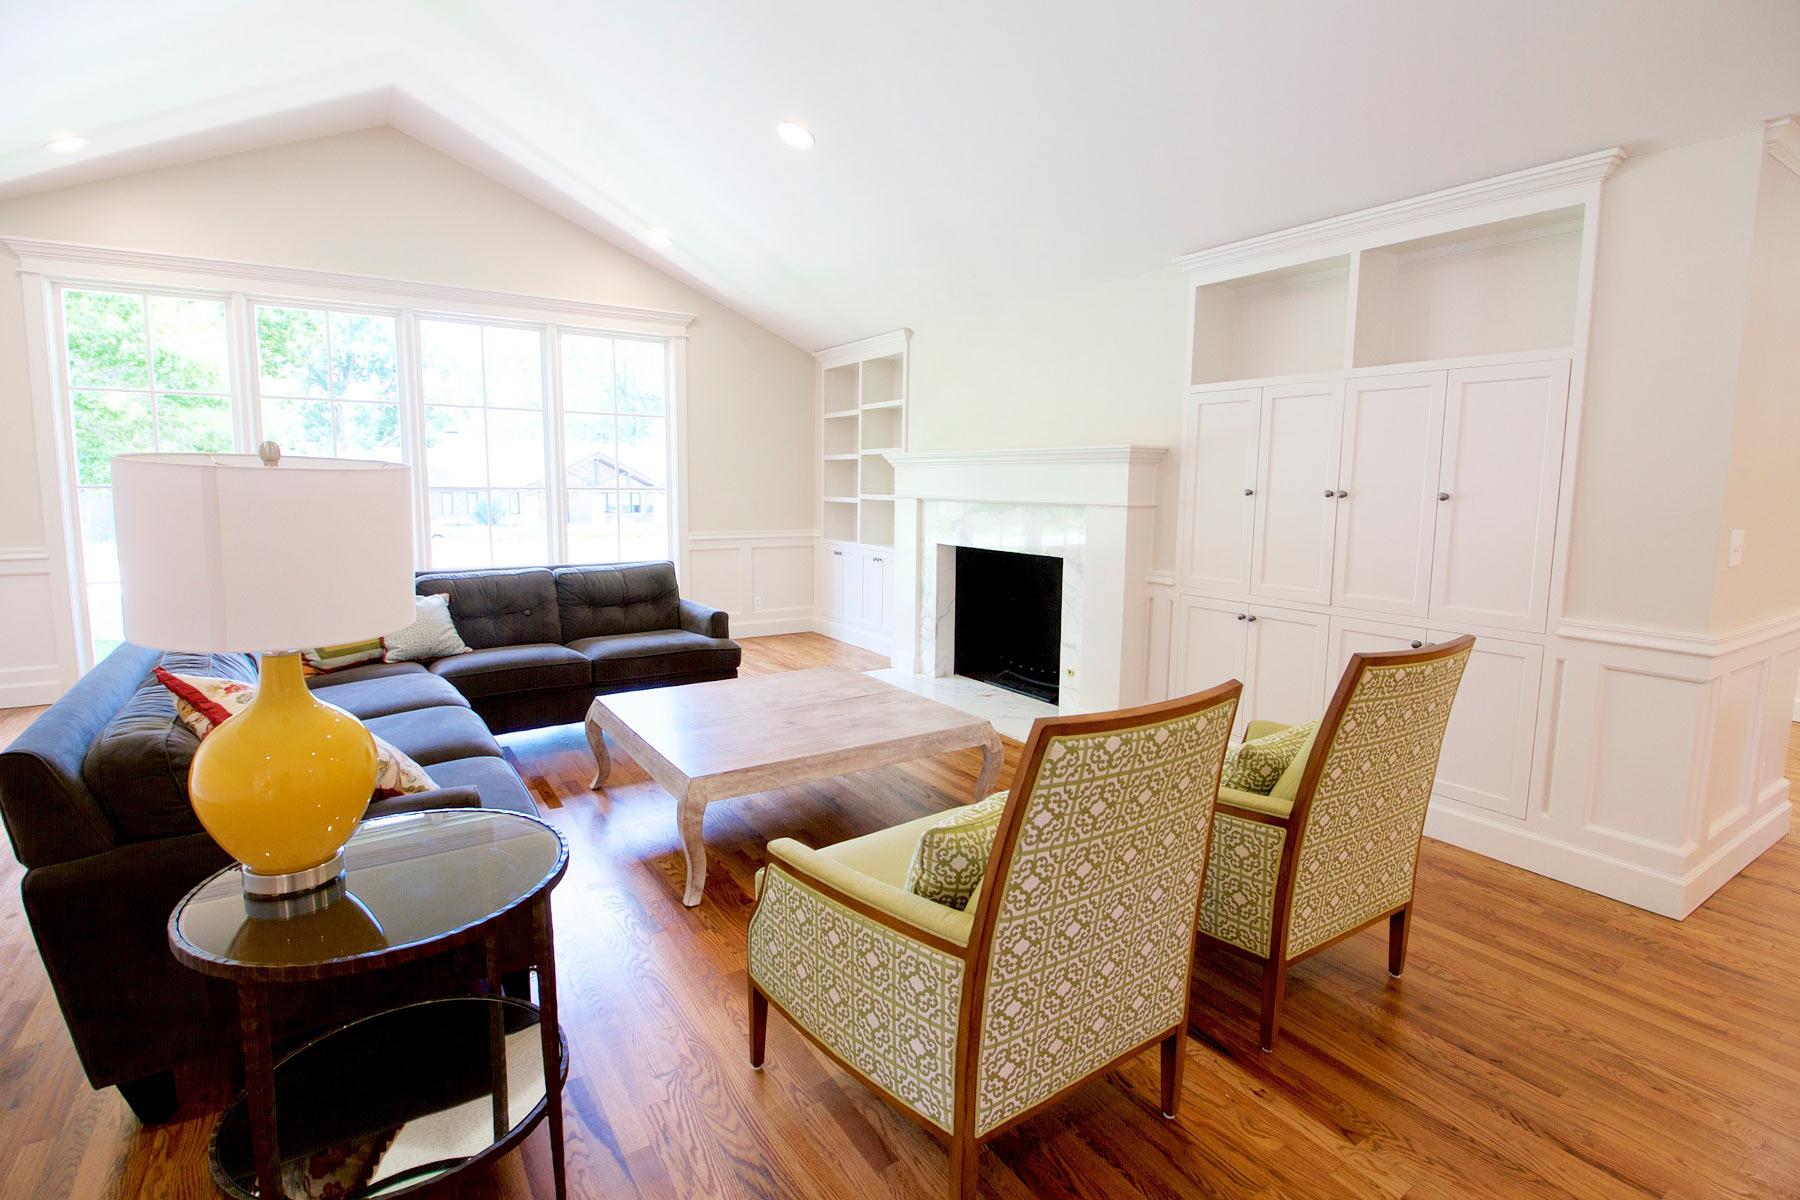 Living Room Remodel  New Living Room Designs  Tulsa